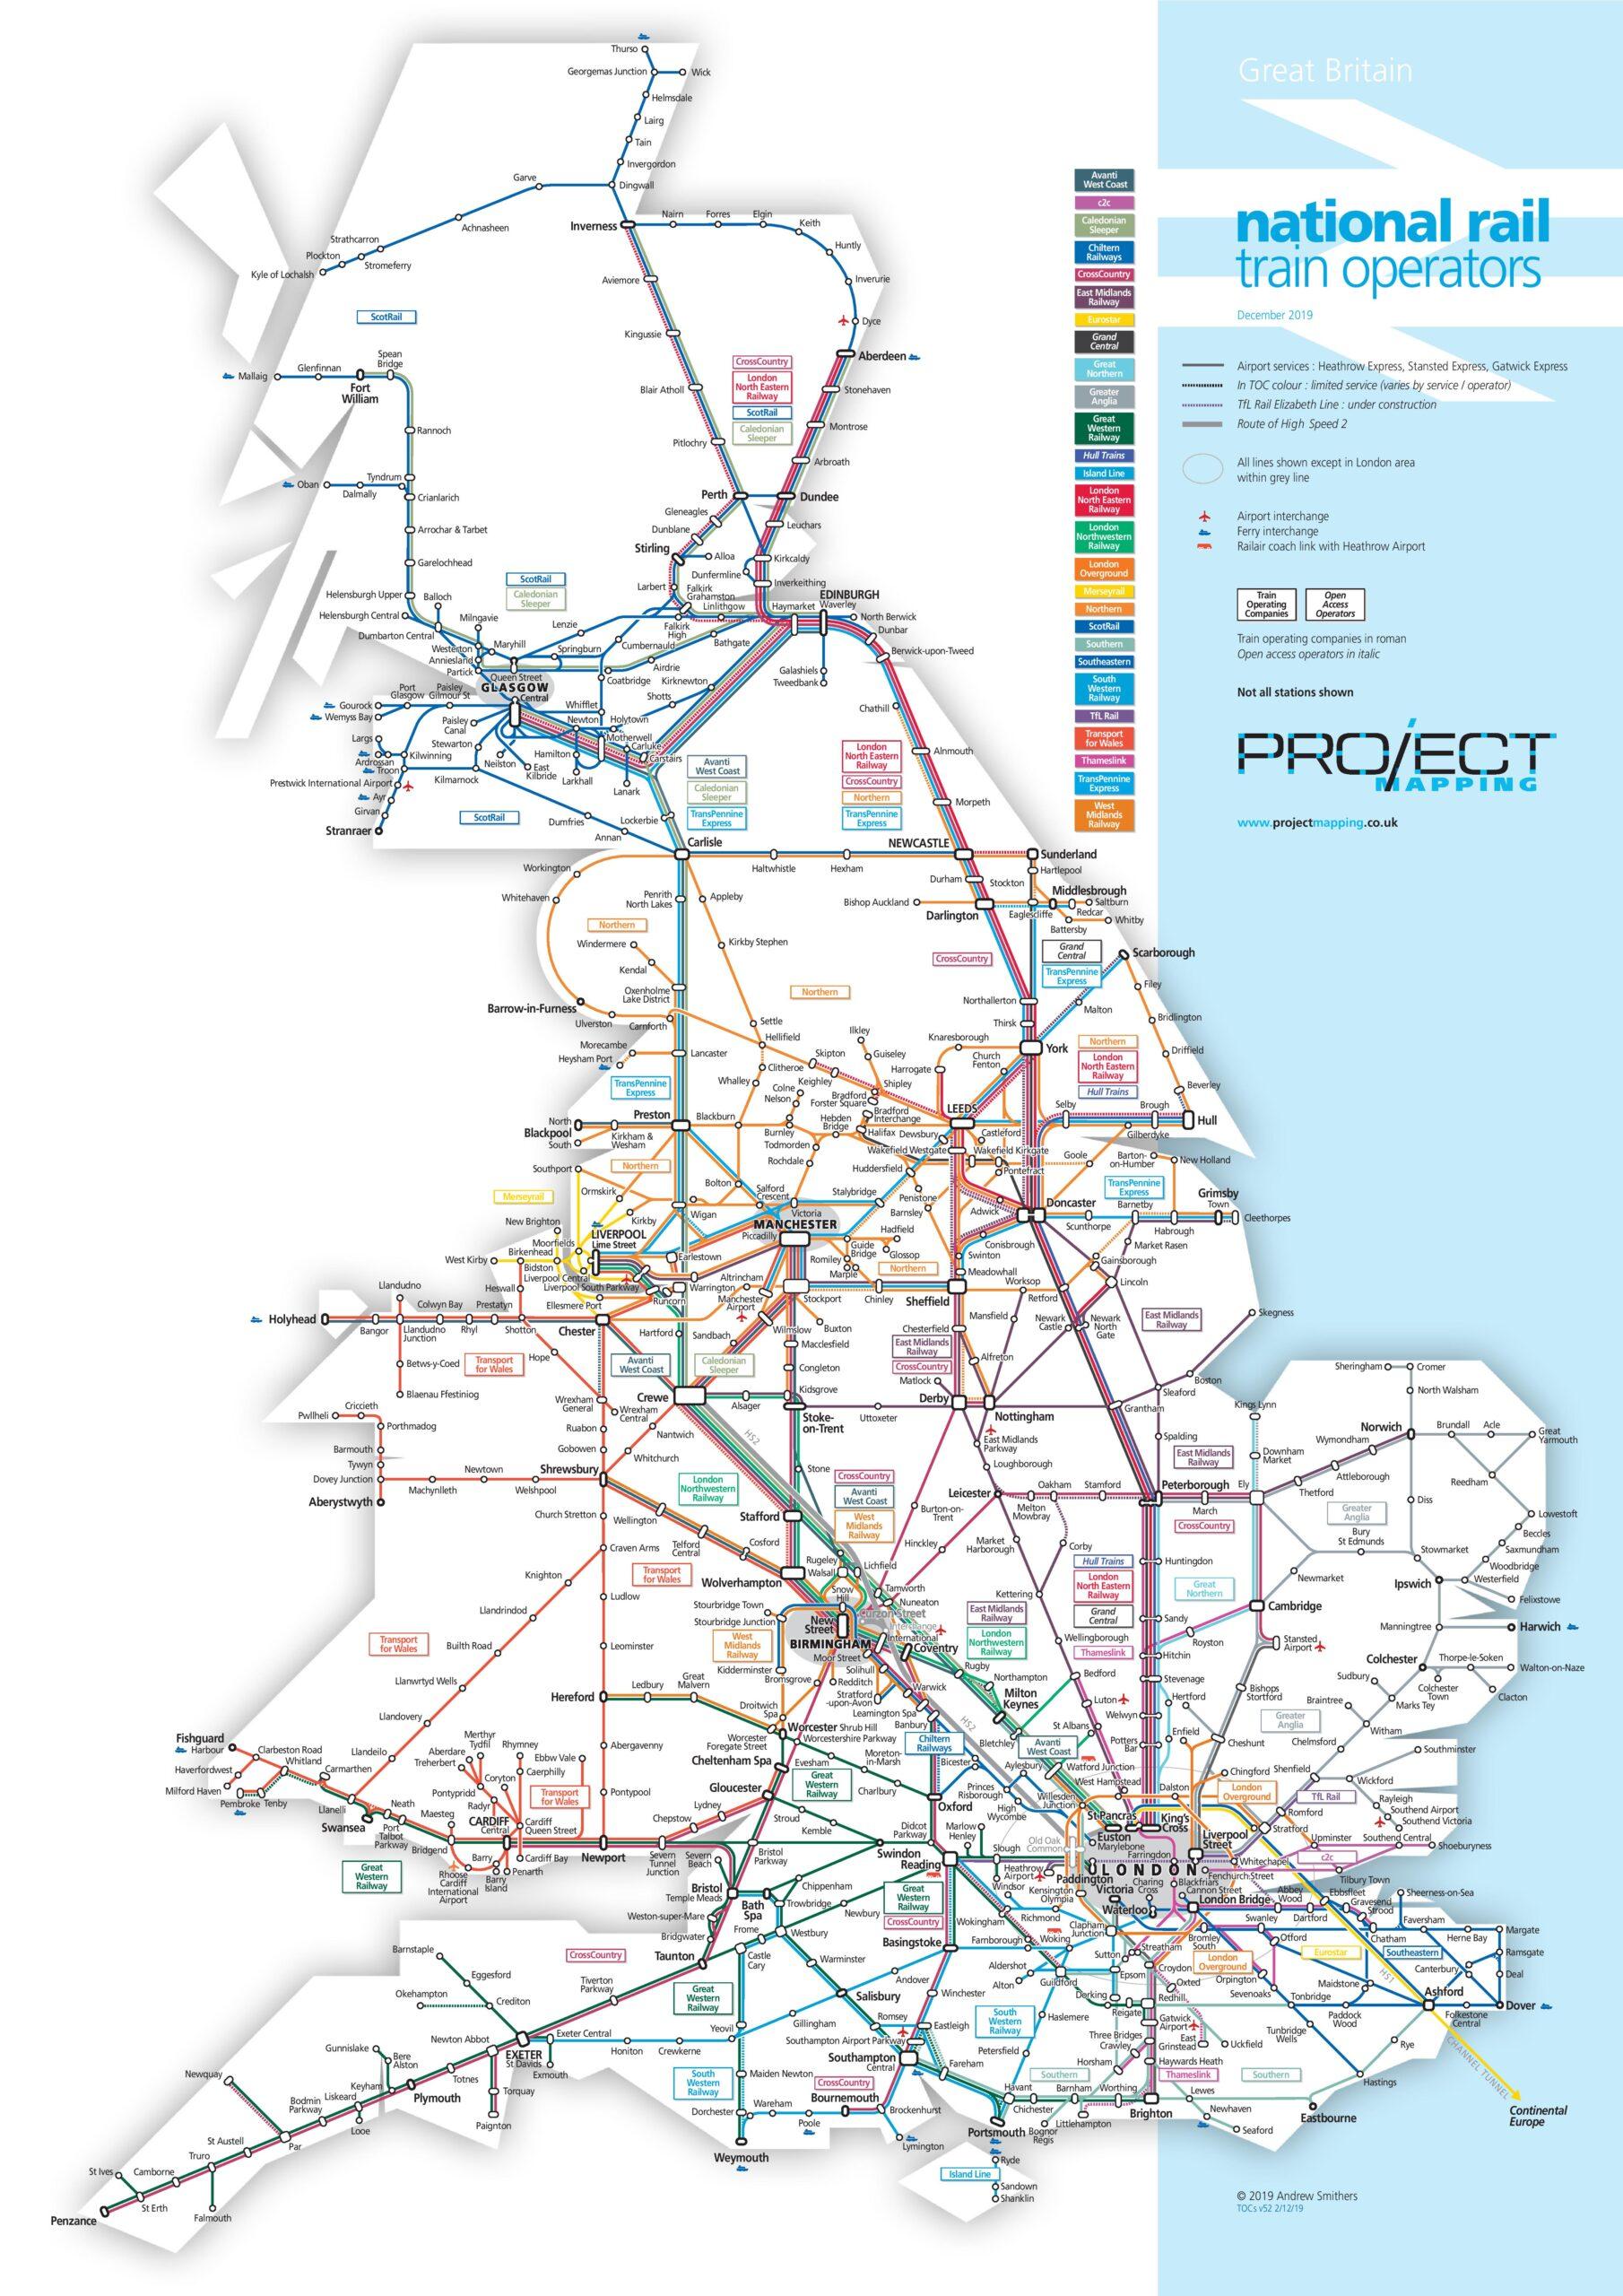 Train operating companies in Great Britain (December 2019)